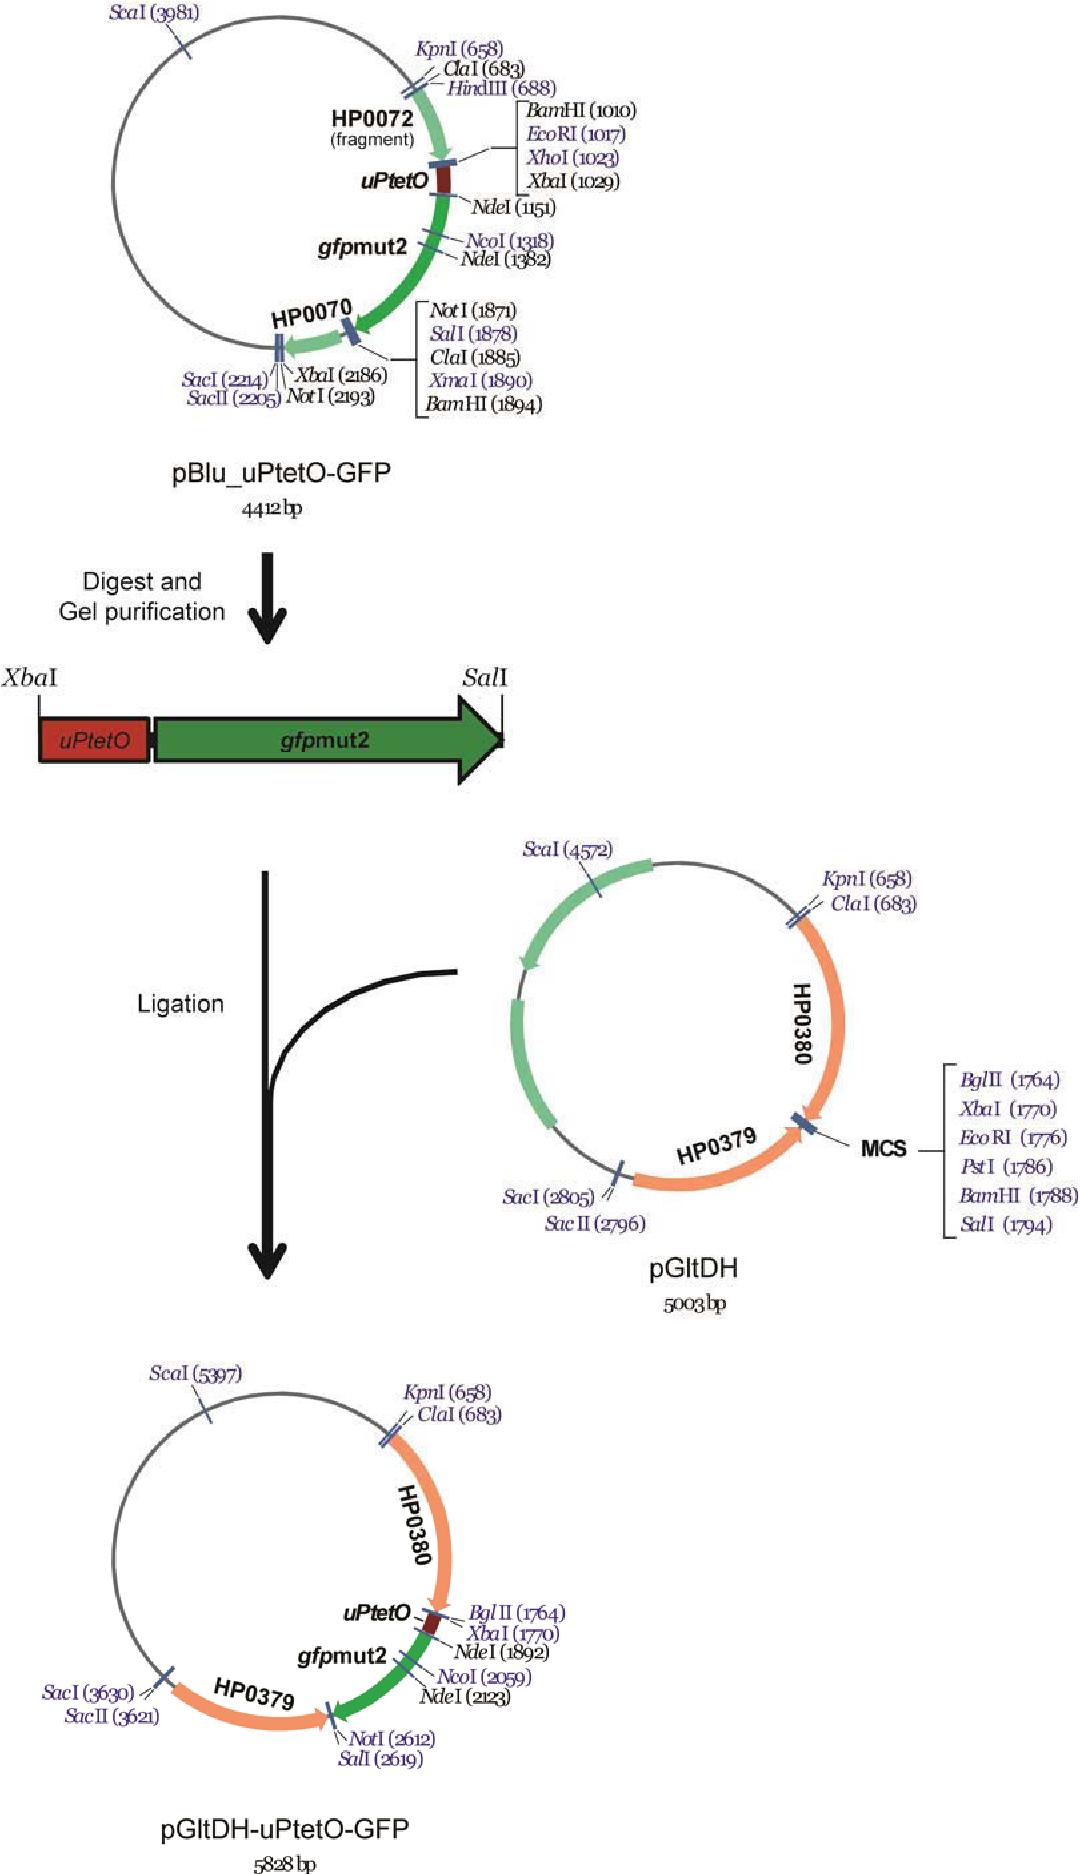 Figure 3-17 Construction of plasmid pGltDH-uPtetO-GFP (pAD320-pAD322)